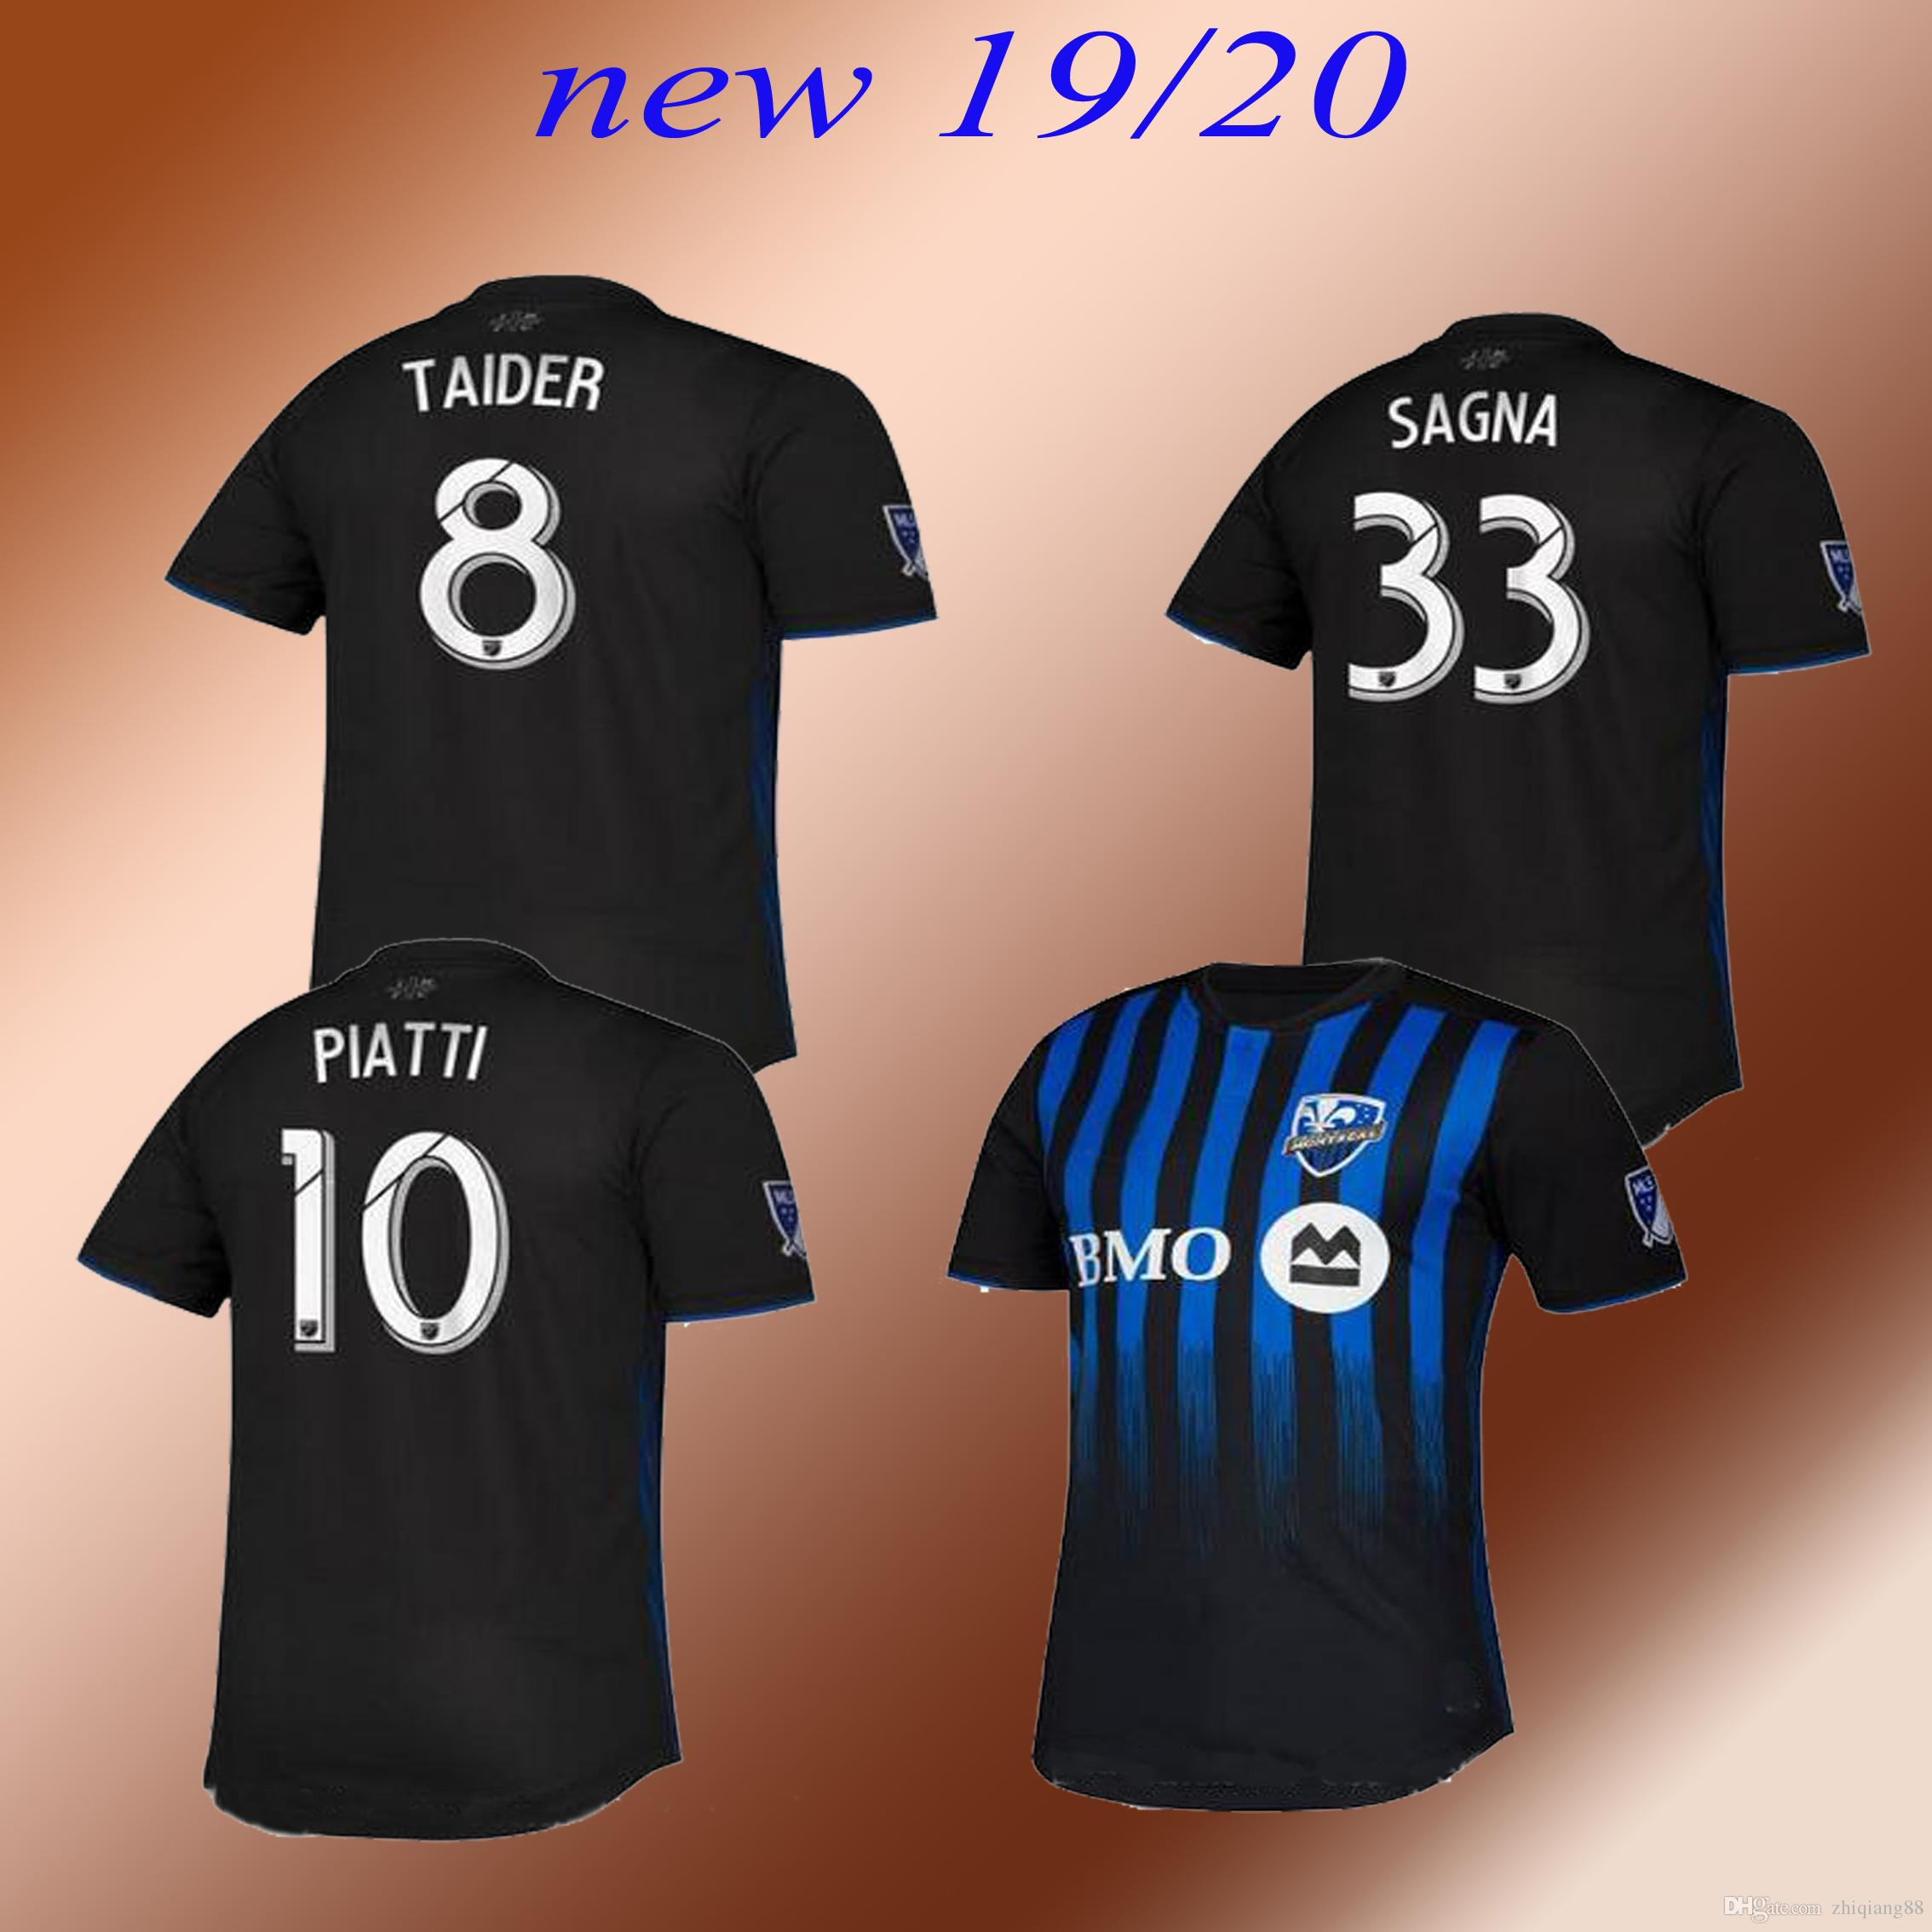 uk availability a6c85 323f7 2019 Montreal Impact home soccer jersey 19 20 montreal jerseys Piette  Taider Piatti Sagna Urruti football shirt